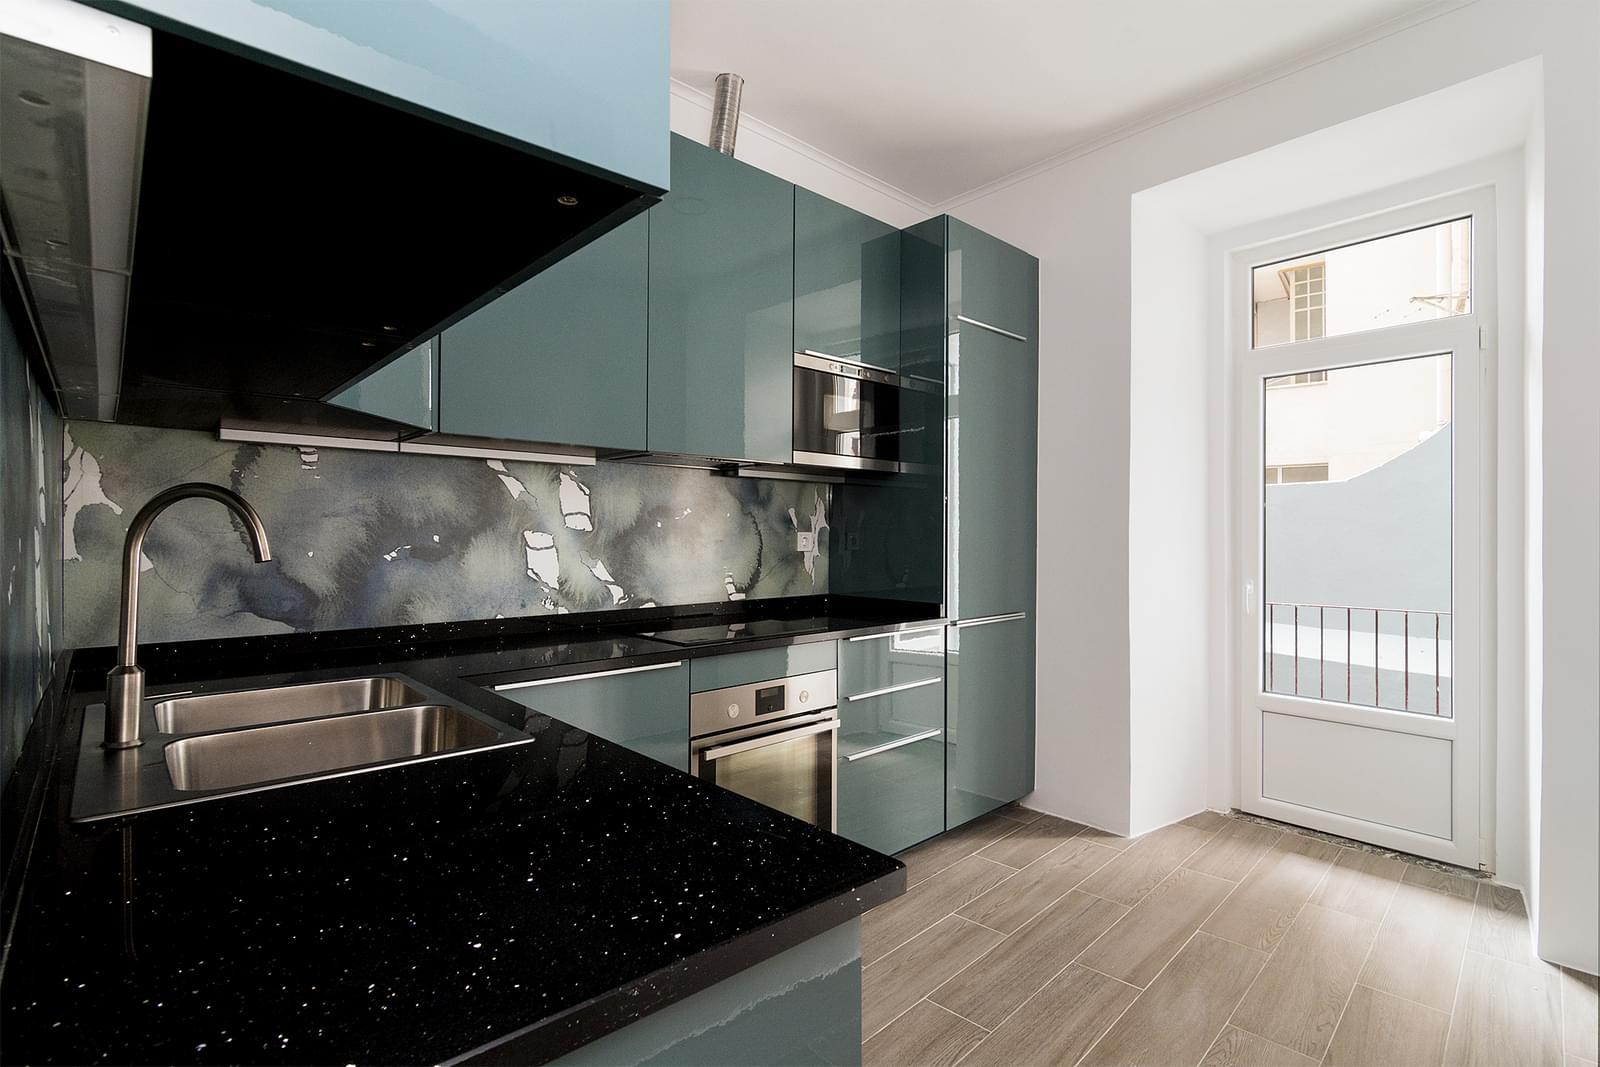 pf17267-apartamento-t3-lisboa-396b21a2-050c-41be-9449-ae5ae64880d5